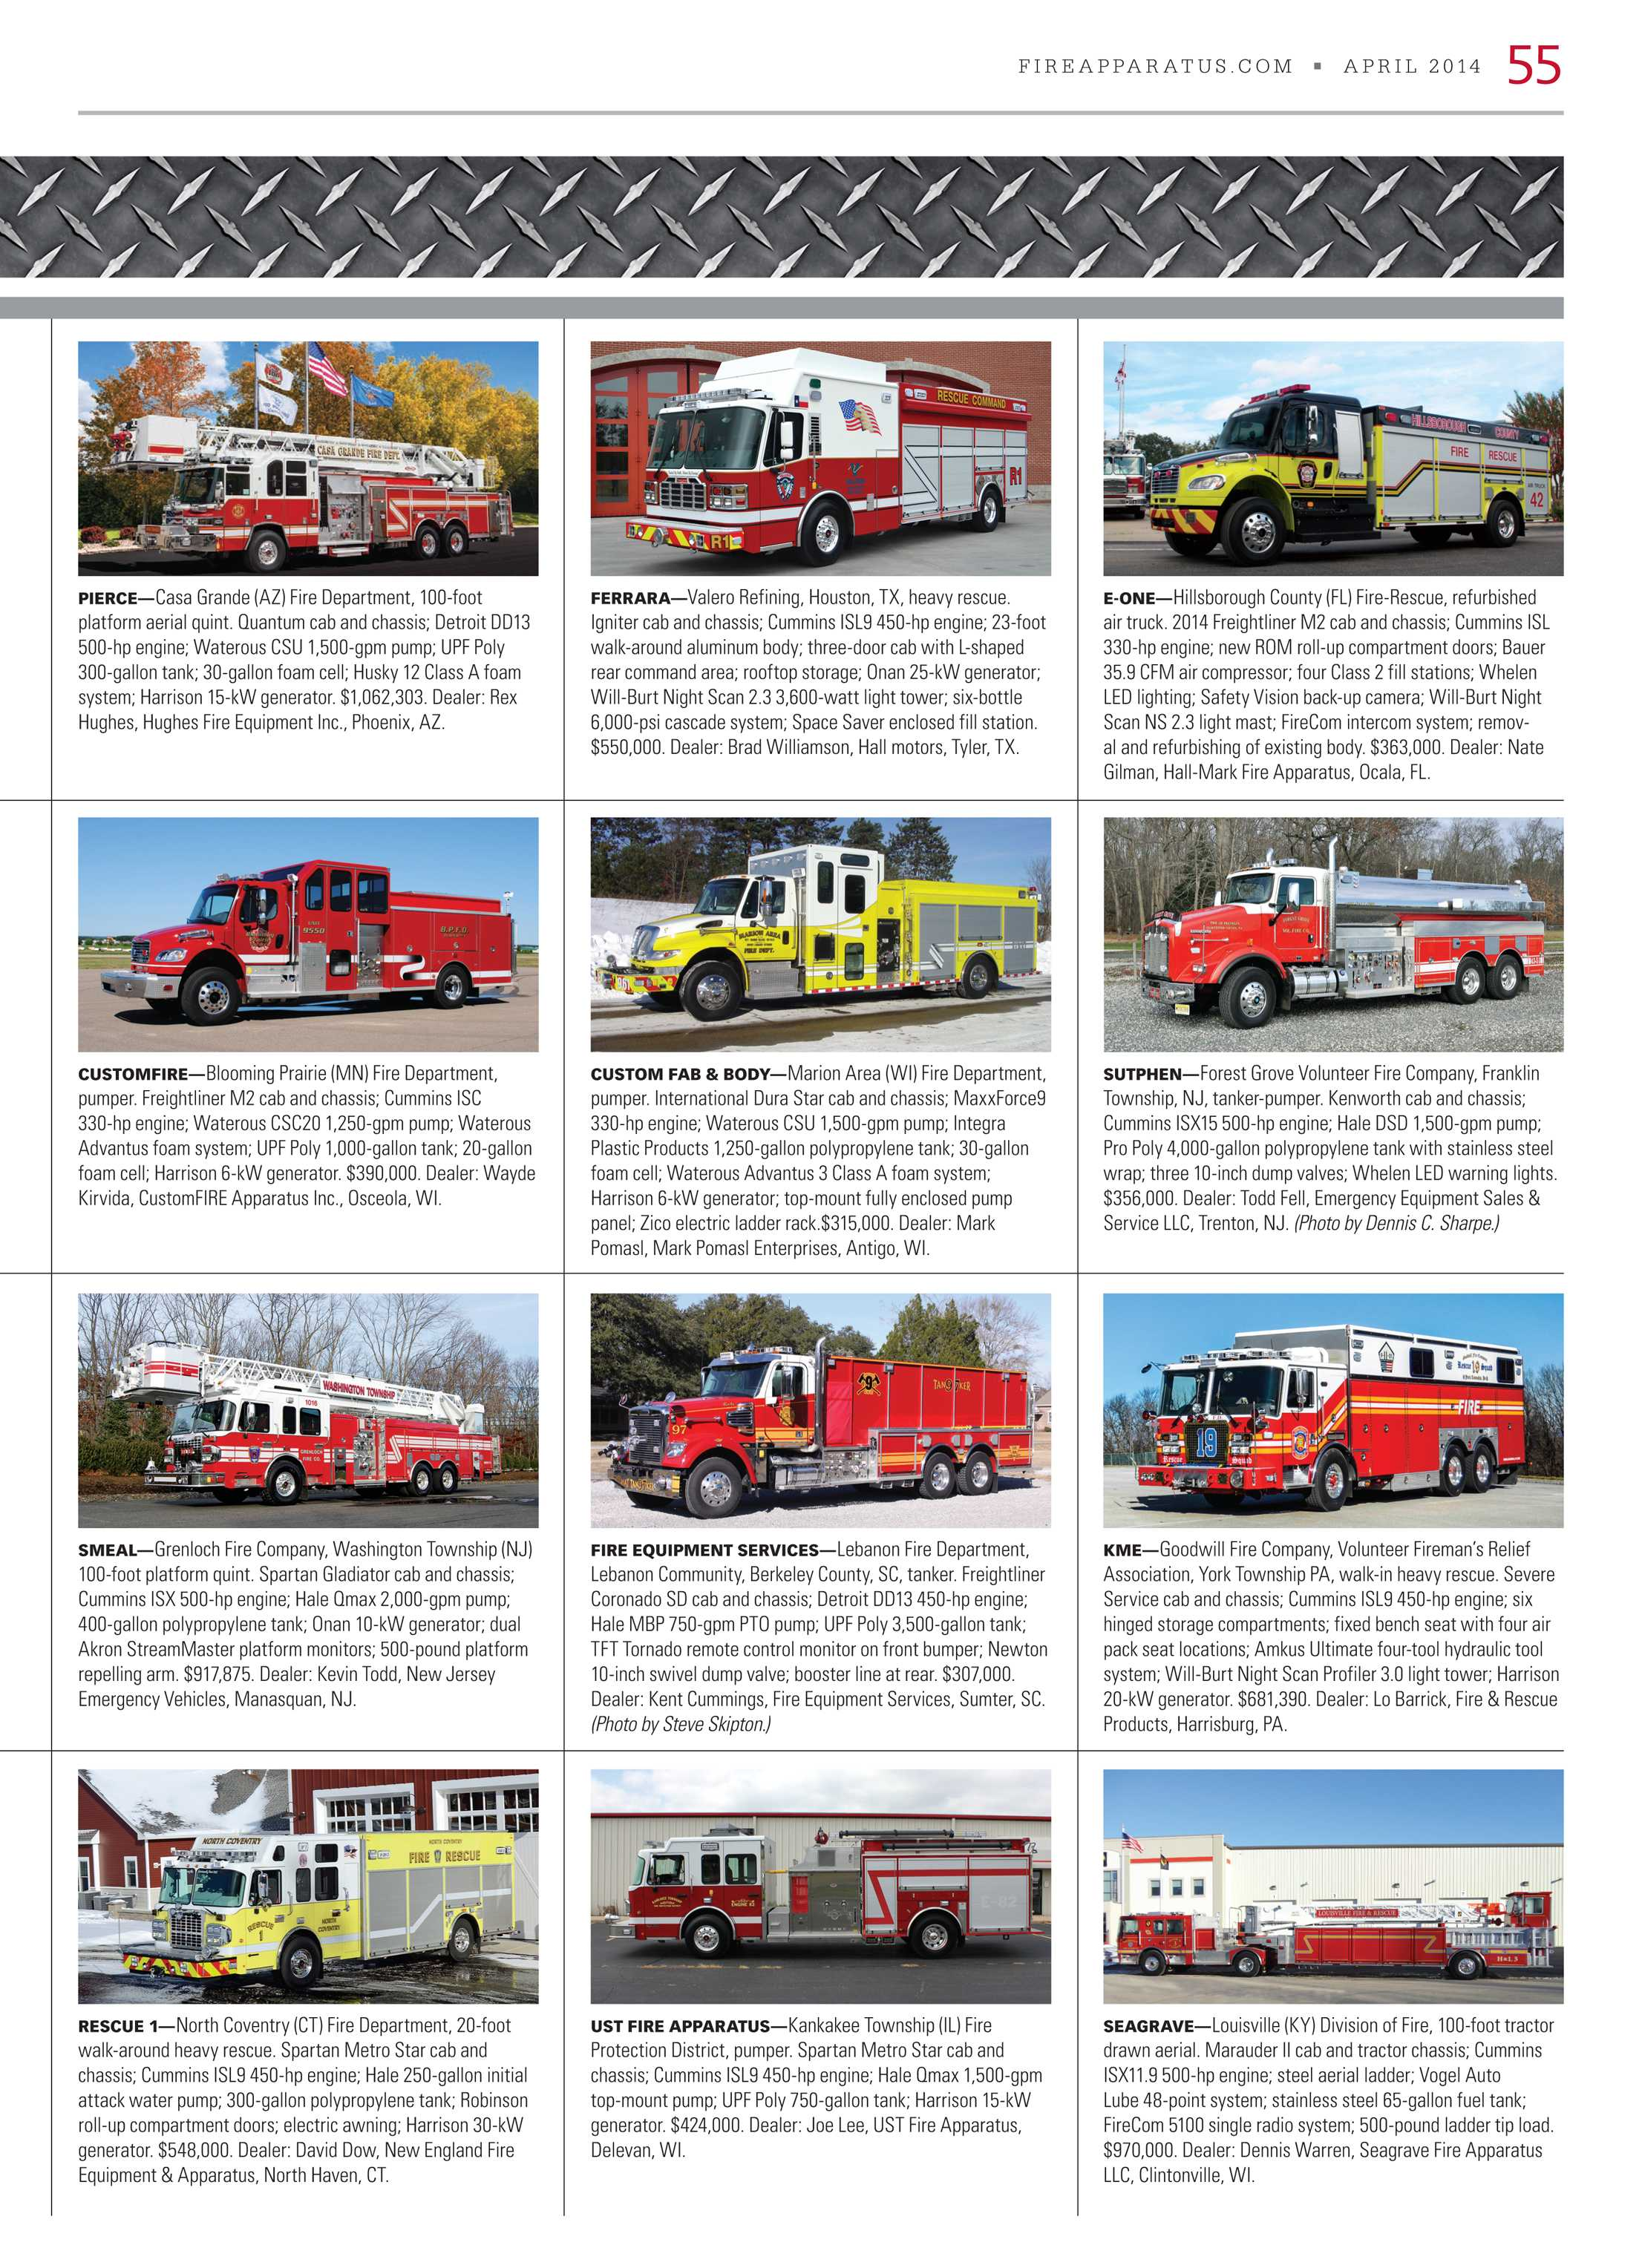 Fire Apparatus Magazine - April 2014 - page 55